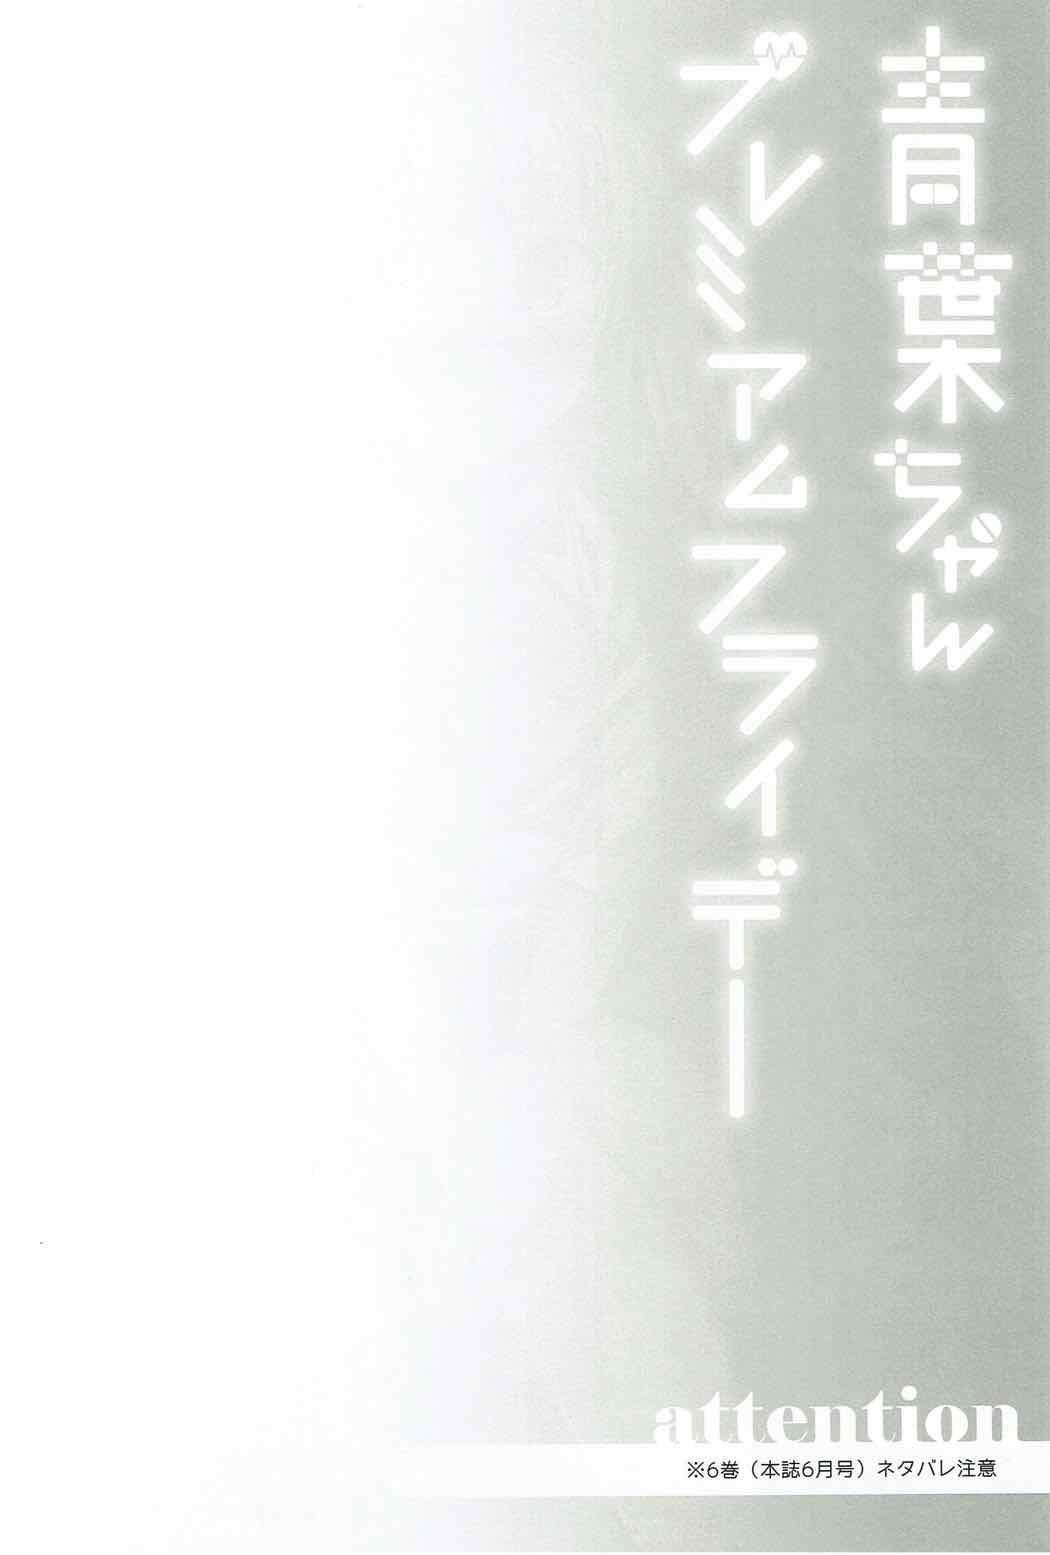 Aoba-chan Premium Friday 2